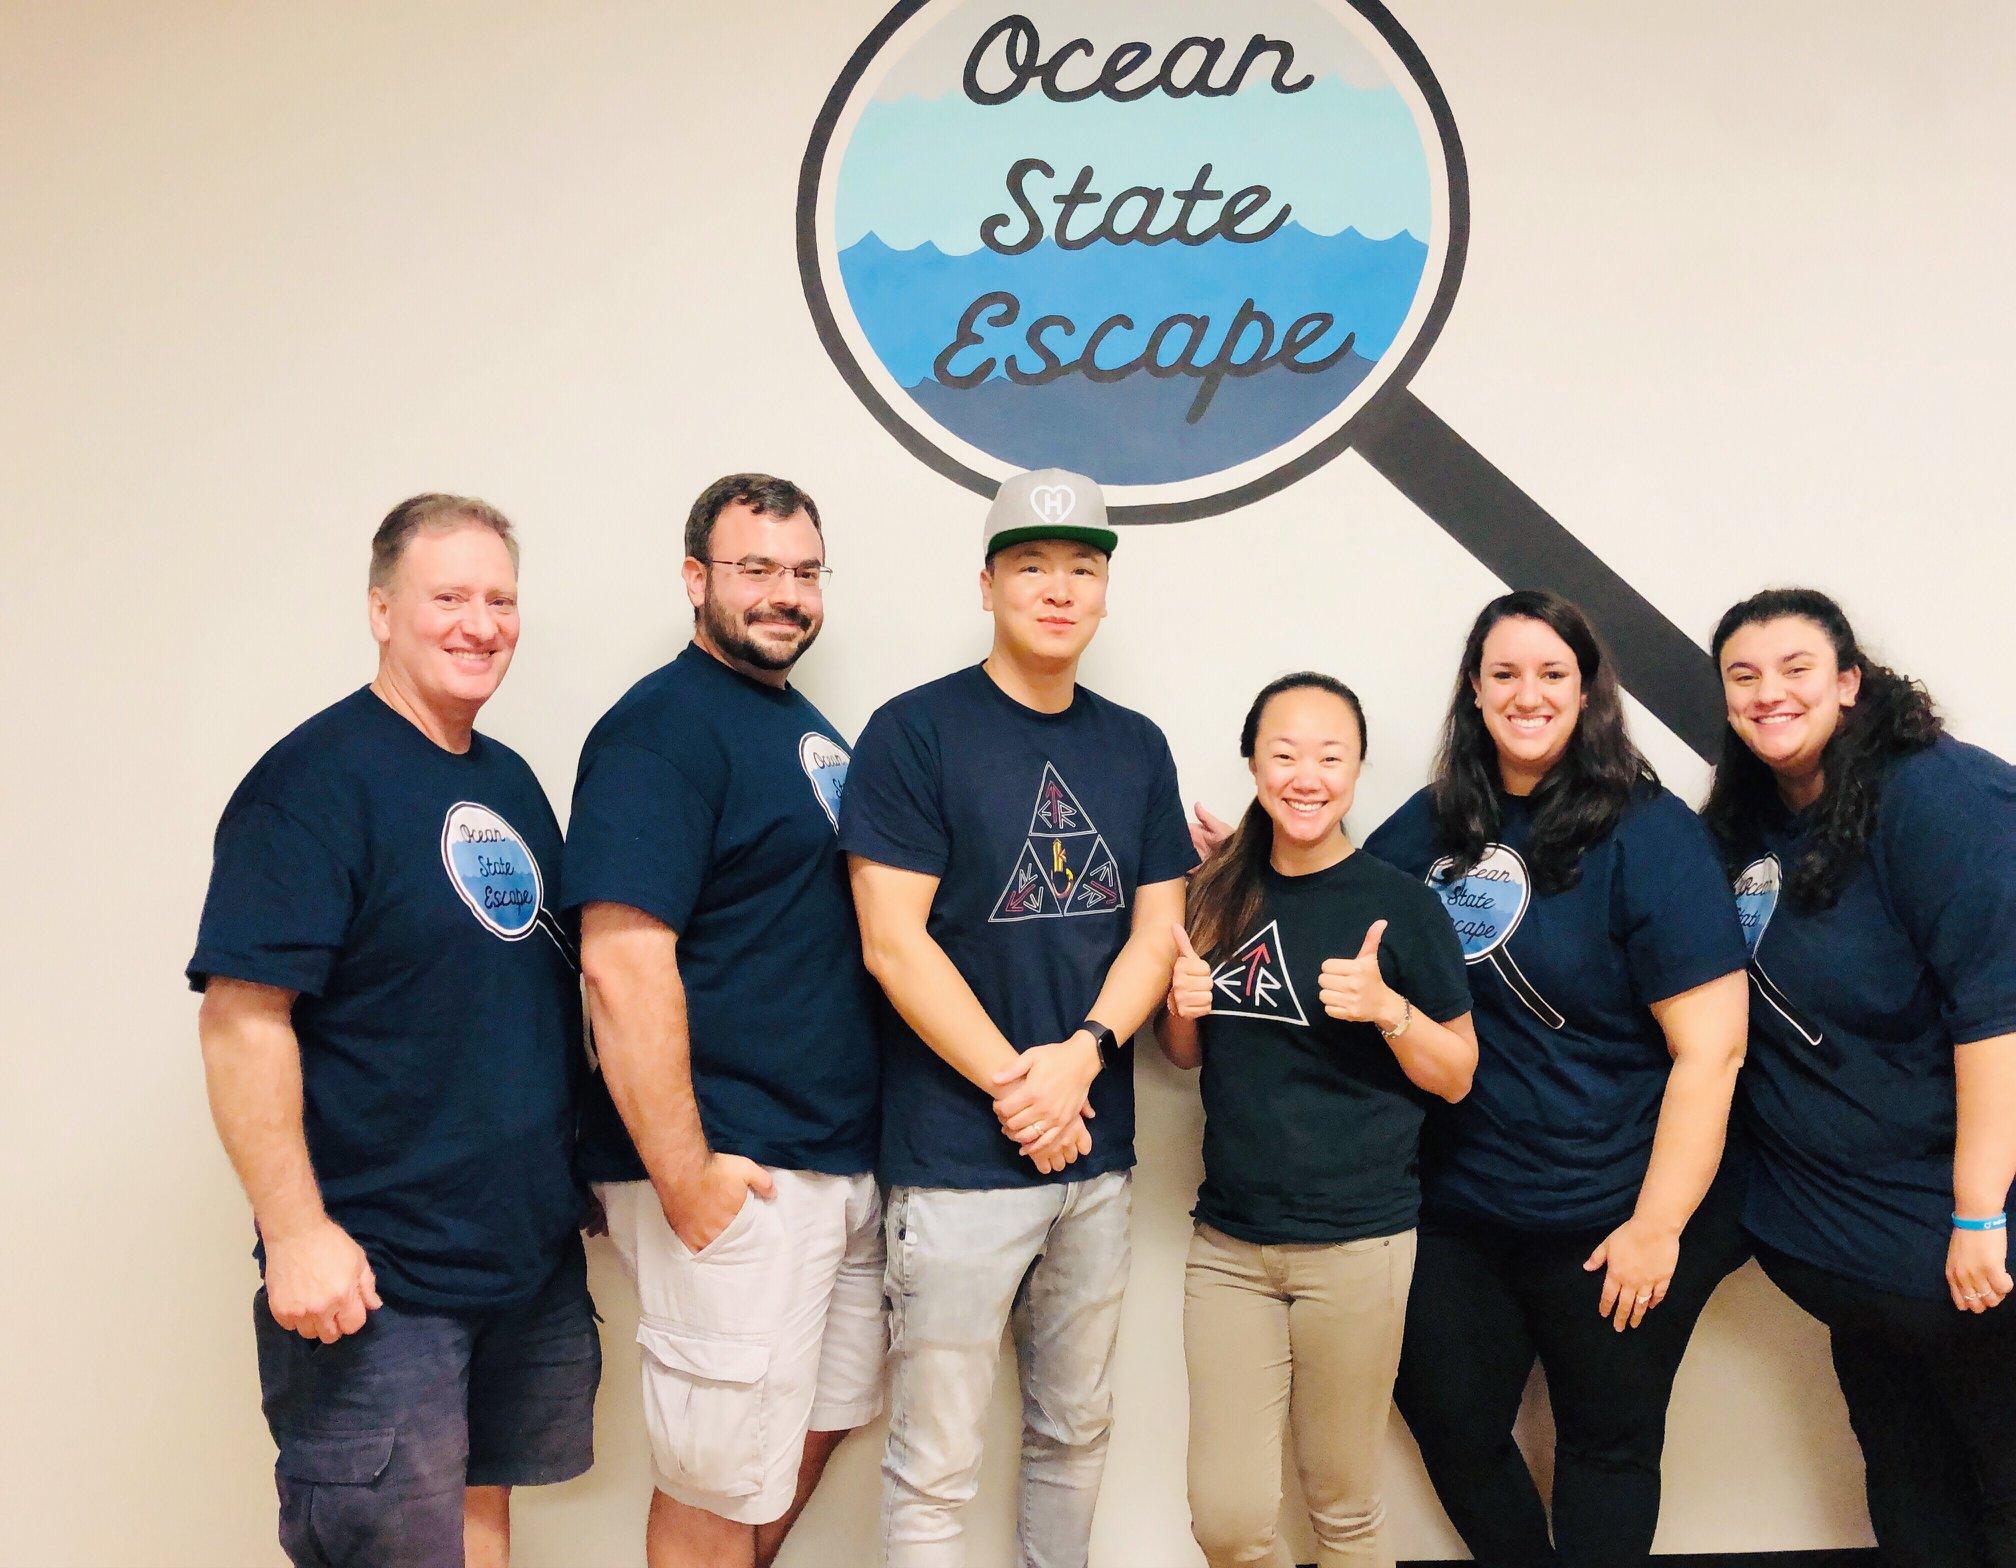 Ocean State Escape